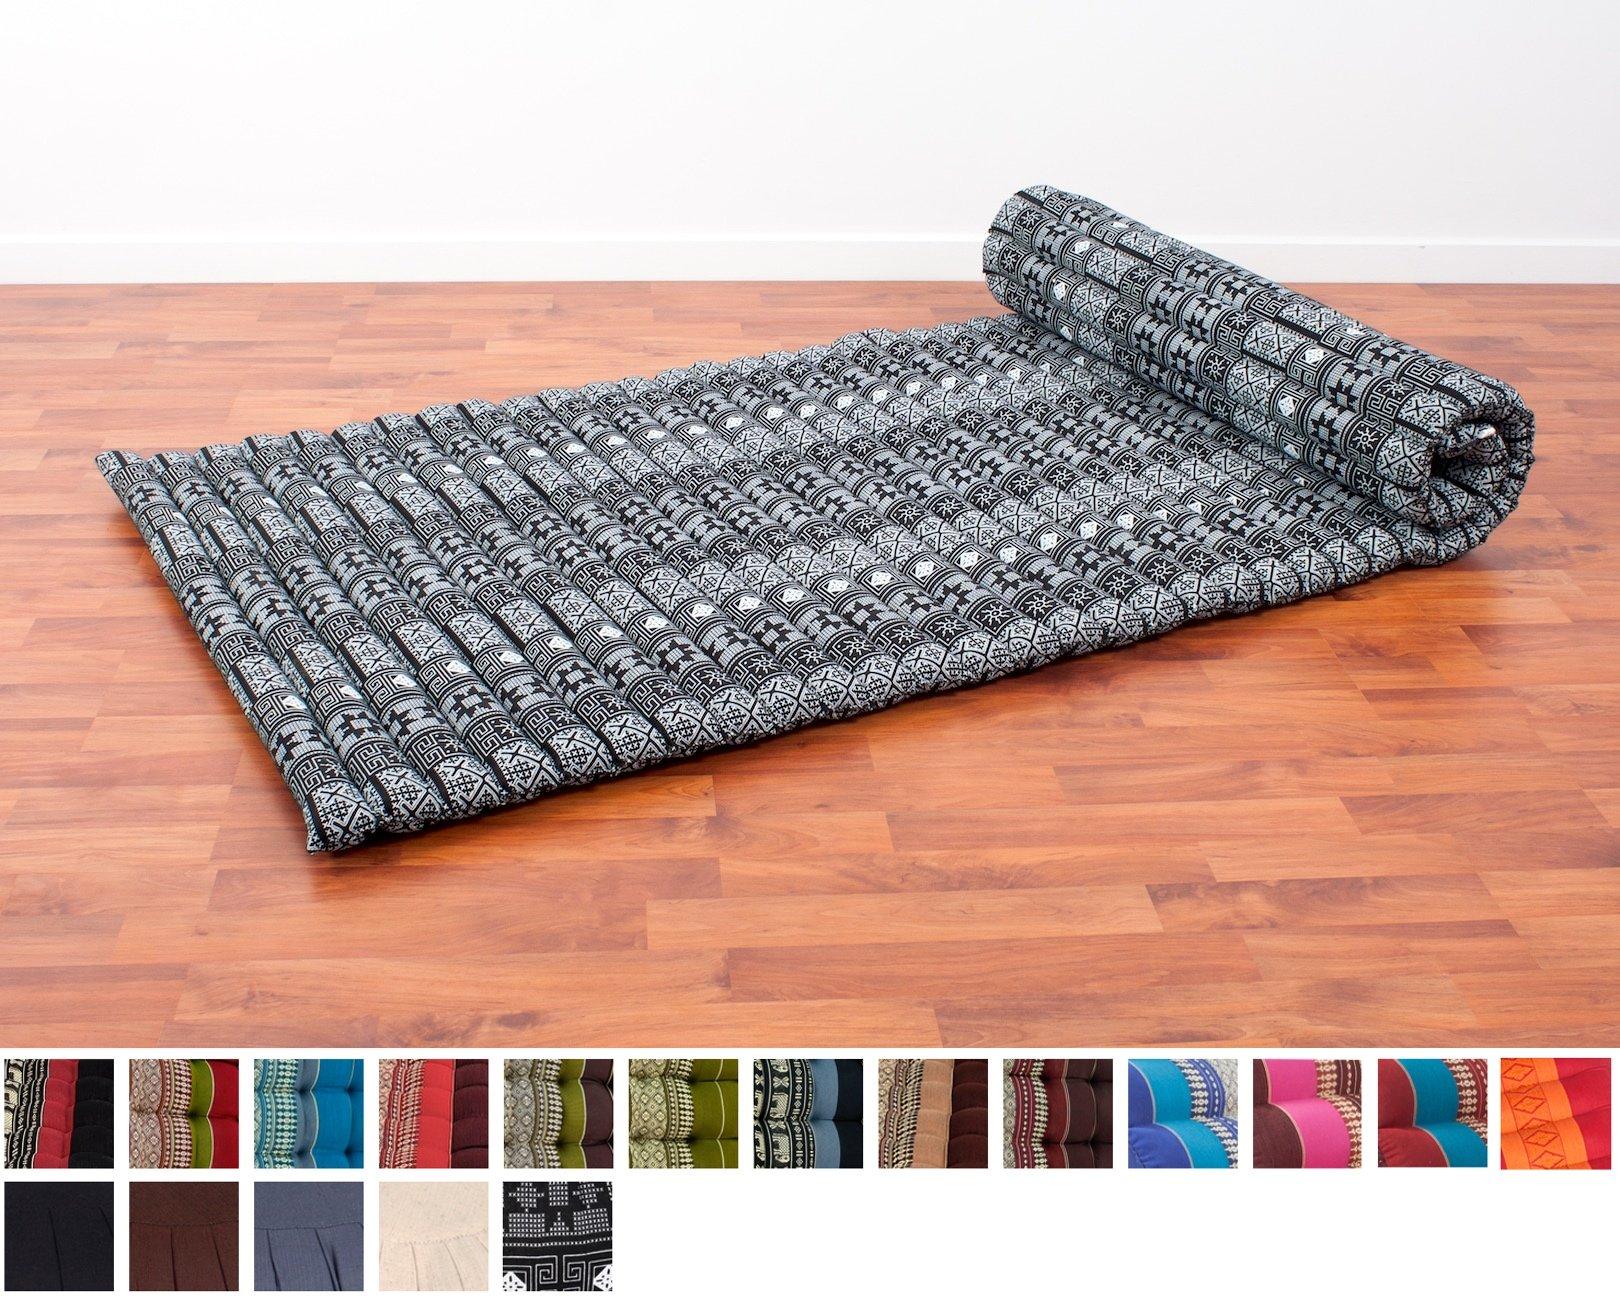 Leewadee Roll Up Thai Mattress, 79x30x2 inches, Kapok Fabric, Black, Premium Double Stitched by Leewadee